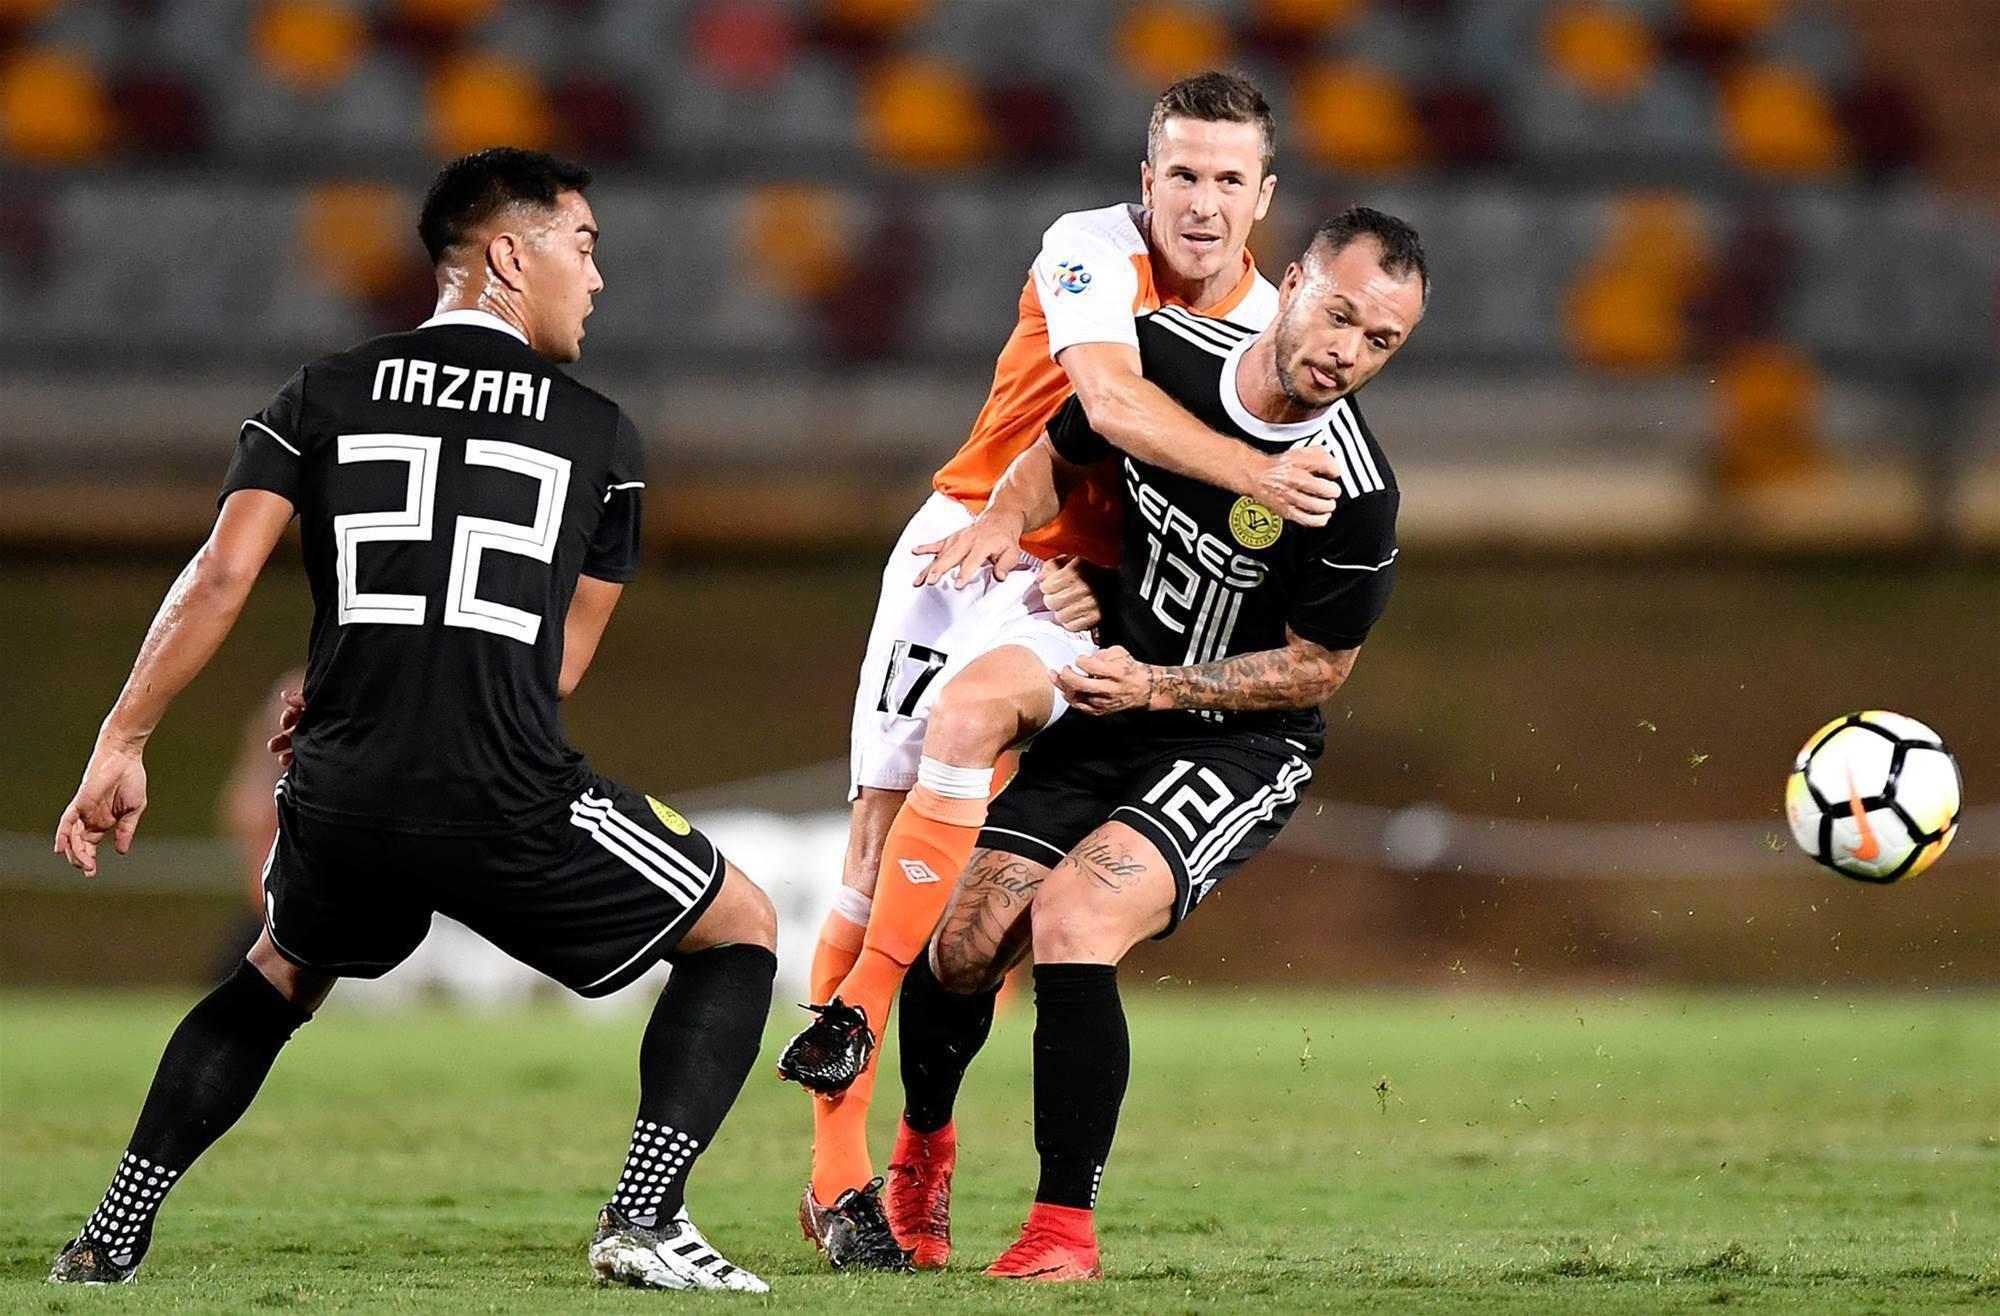 'Truly embarrassing': Bosnich slams jersey farce as Ceres-Negros stun Brisbane Roar